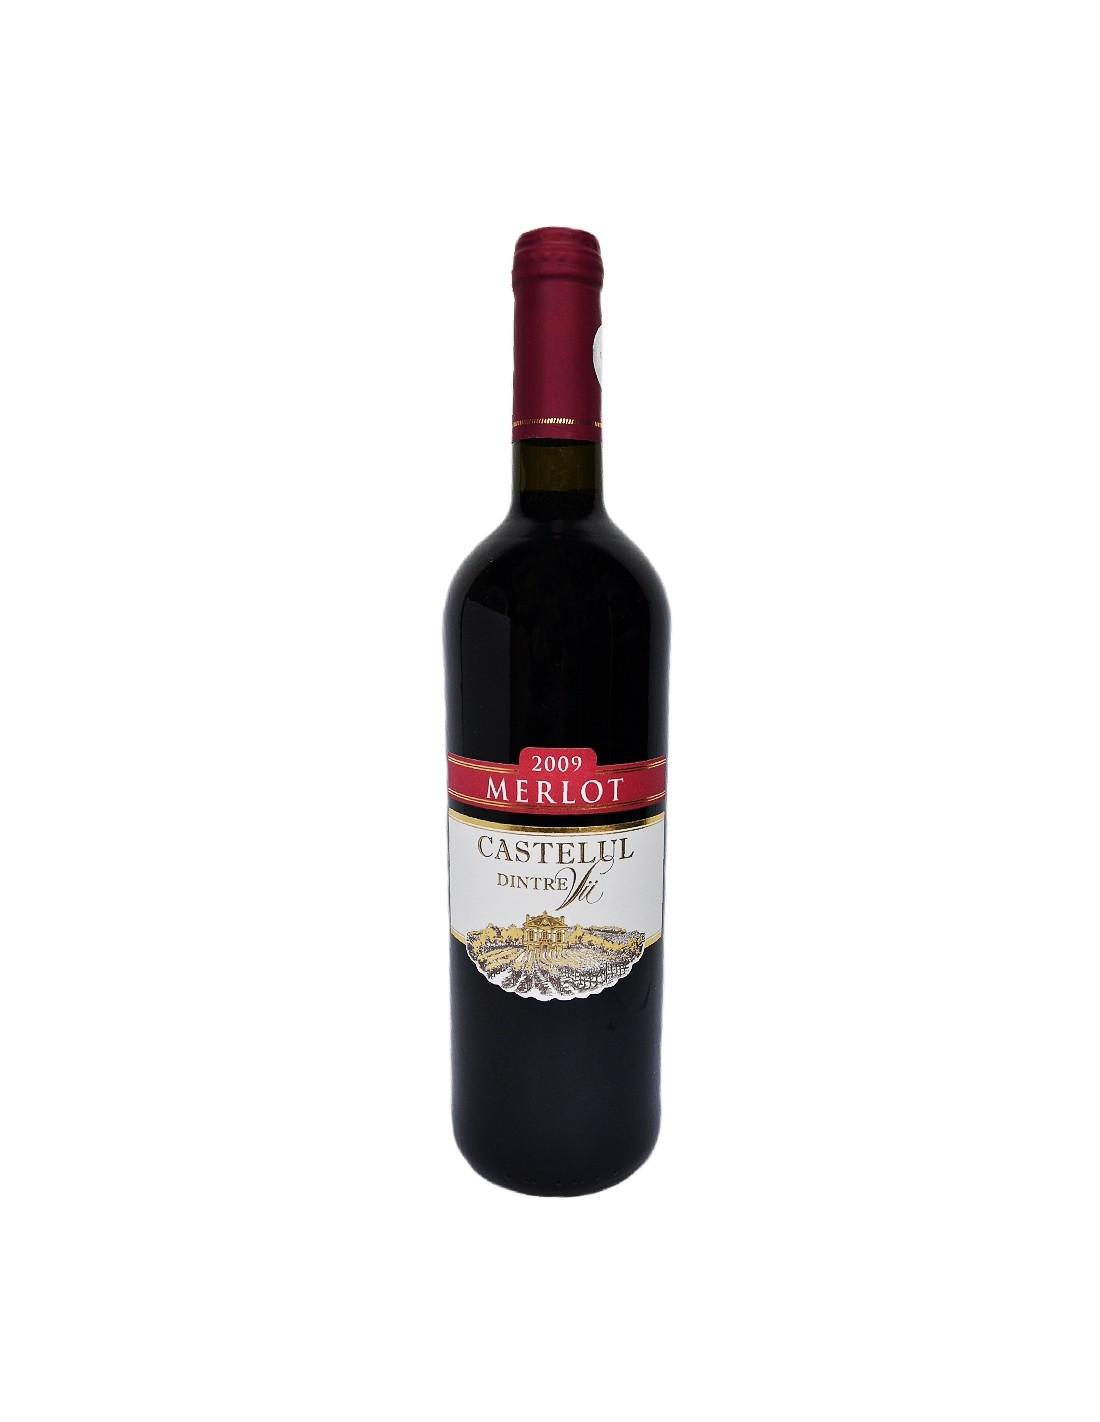 Vin rosu sec, Merlot, Castelul dintre Vii, 0.75L, 11.5% alc., Republica Moldova